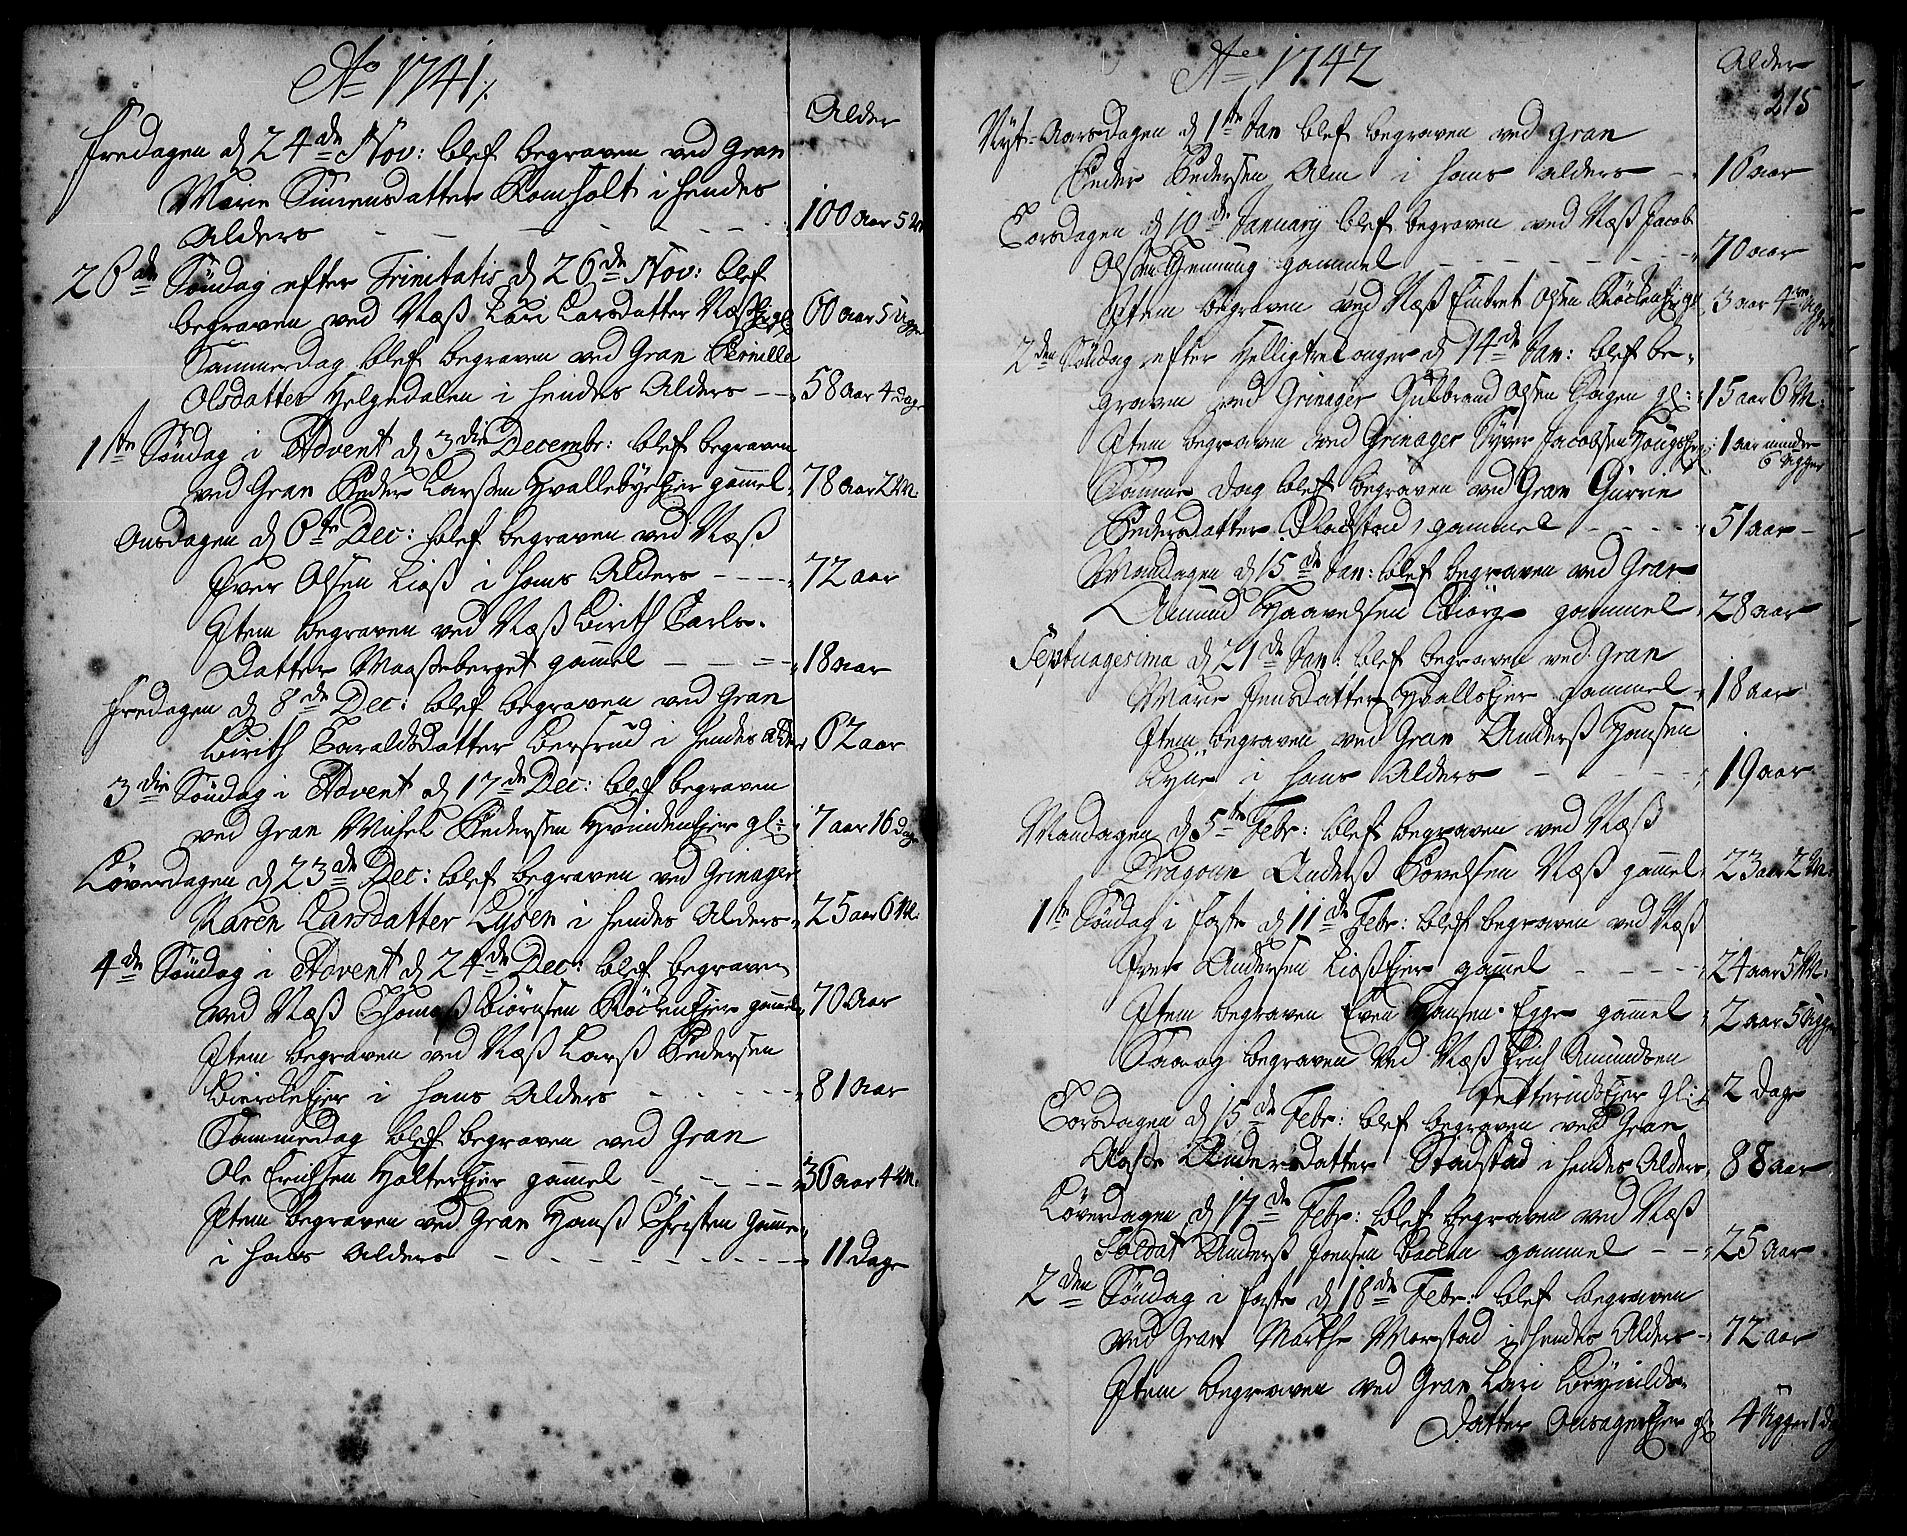 SAH, Gran prestekontor, Ministerialbok nr. 2, 1732-1744, s. 215